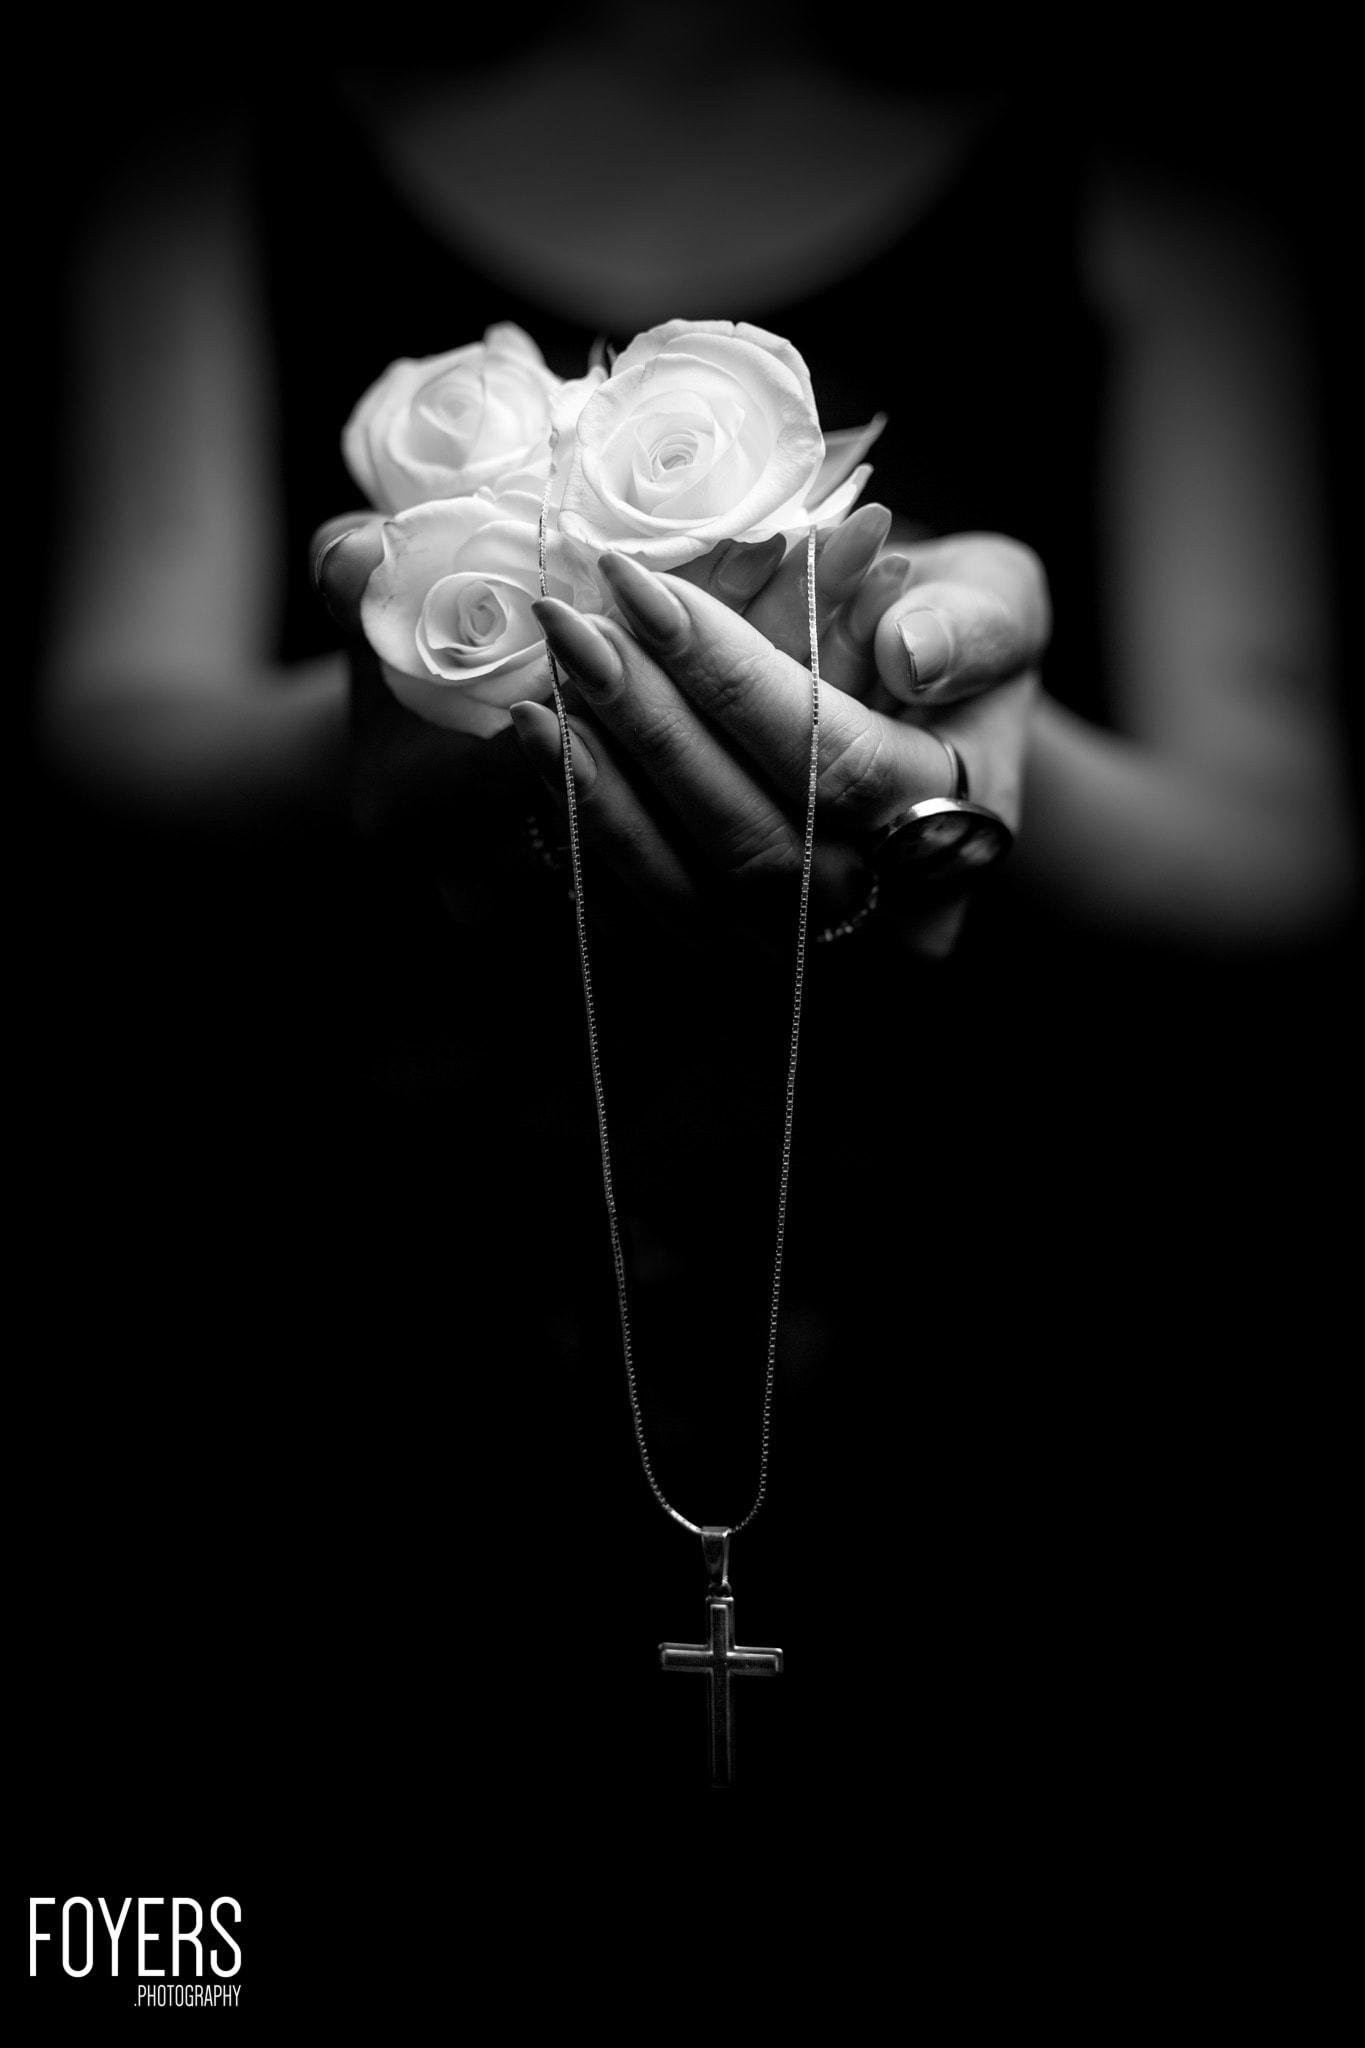 White rose in hands-2550-dogwood52 - copyright Robert Foyers